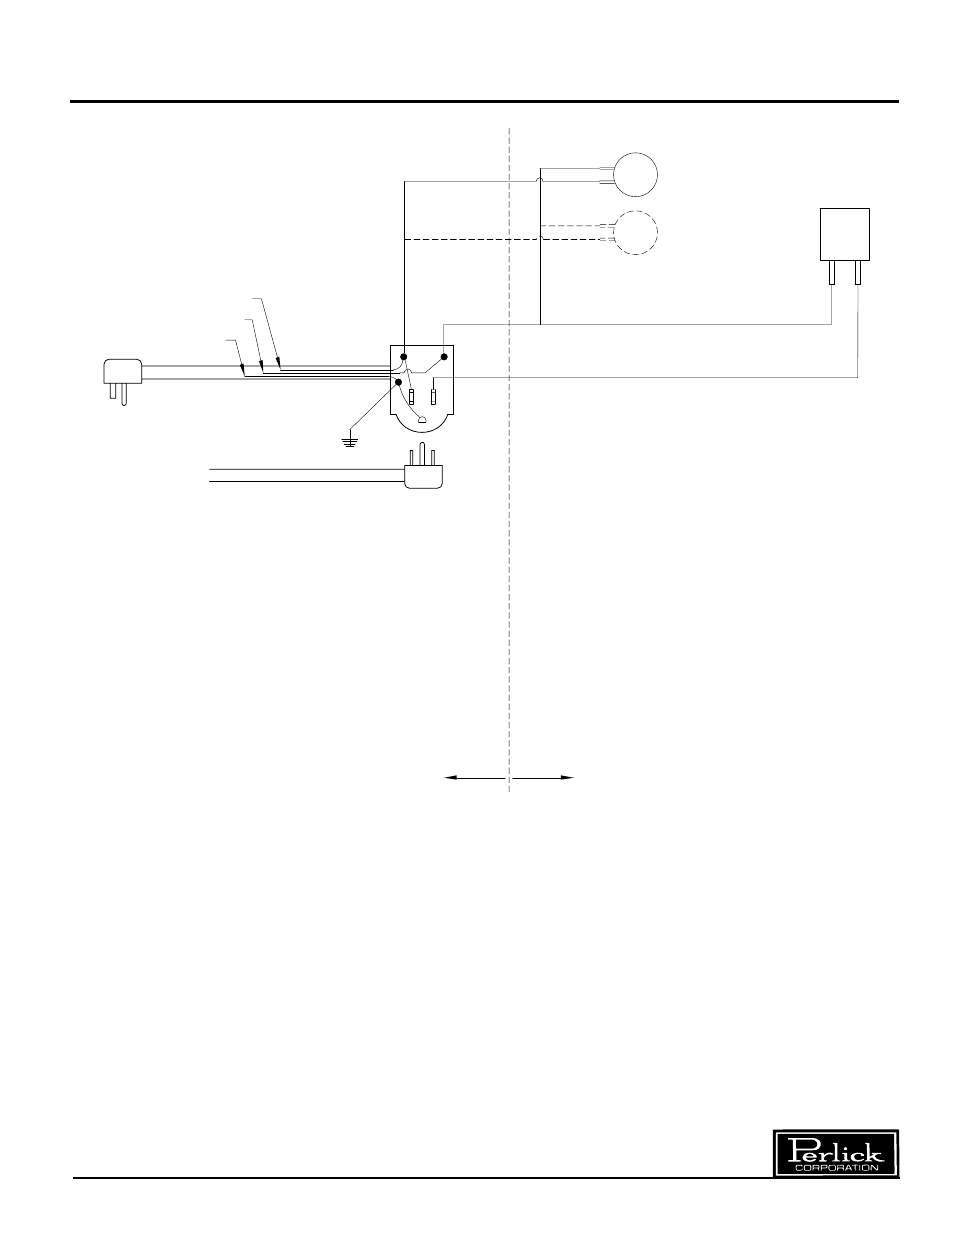 wiring diagram flat top bottle coolers perlick bc48 series user rh manualsdir com